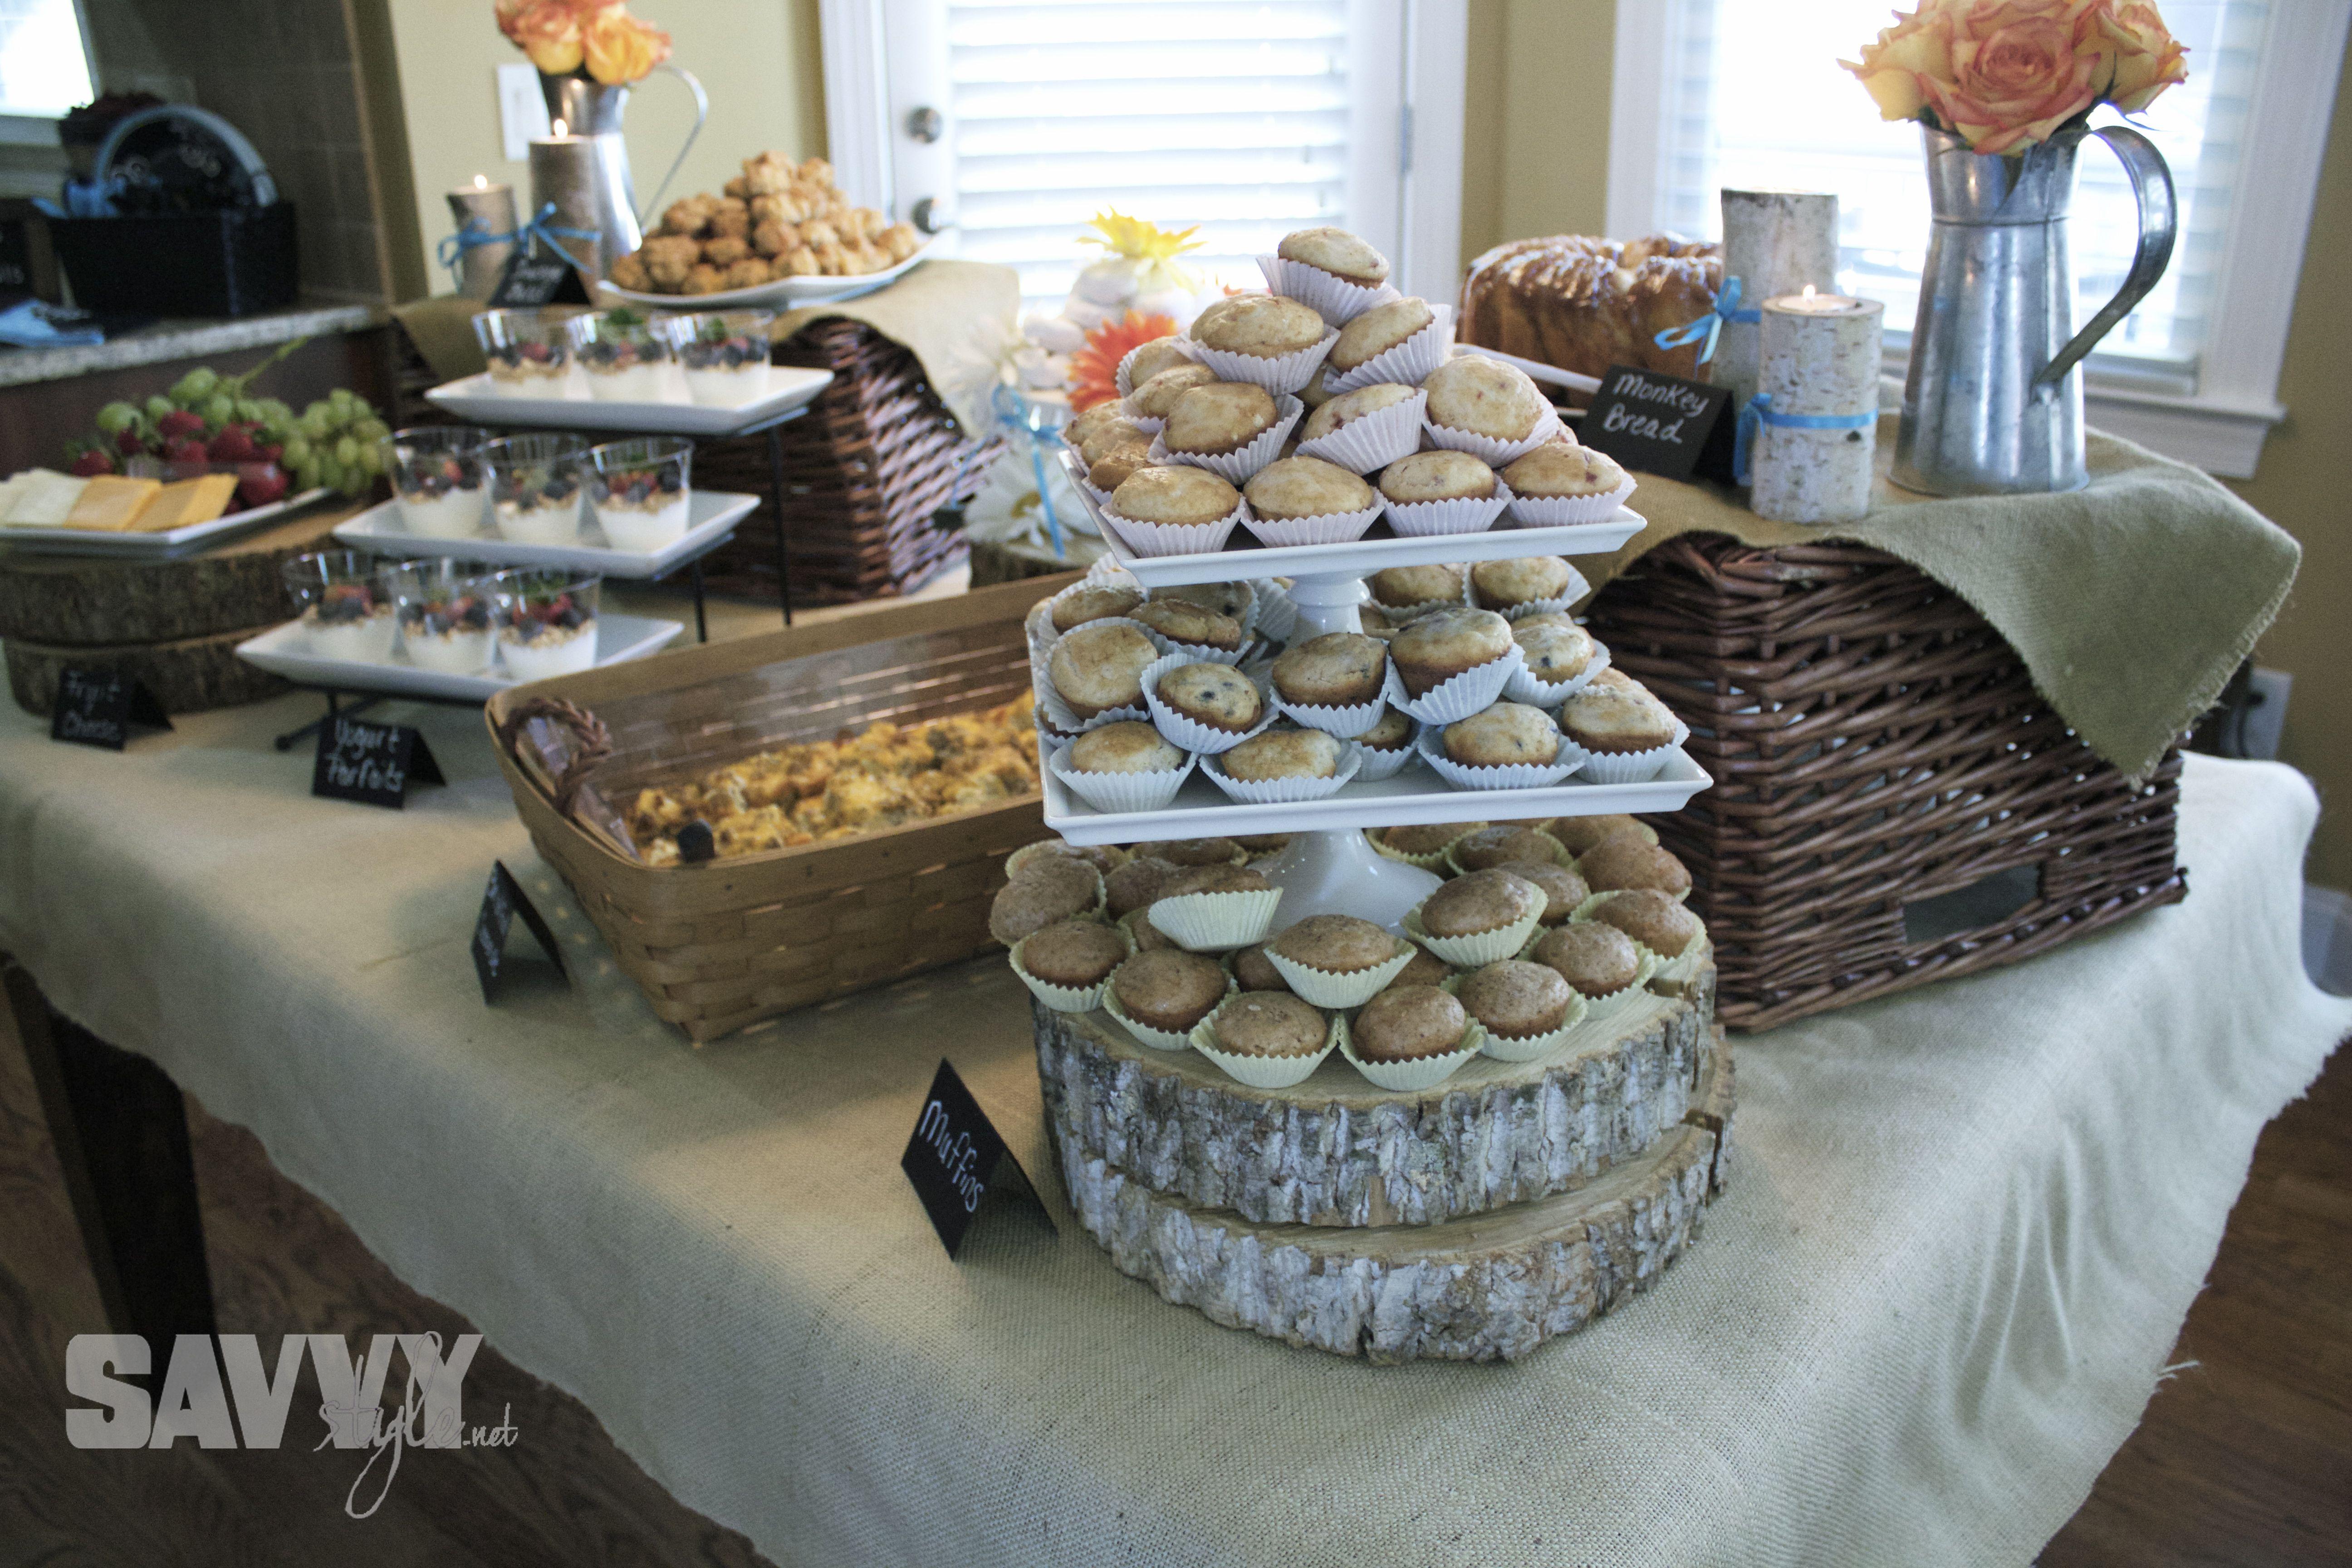 Rustic Bridal Shower Brunch Food Display Savvystyle 2013 04 21